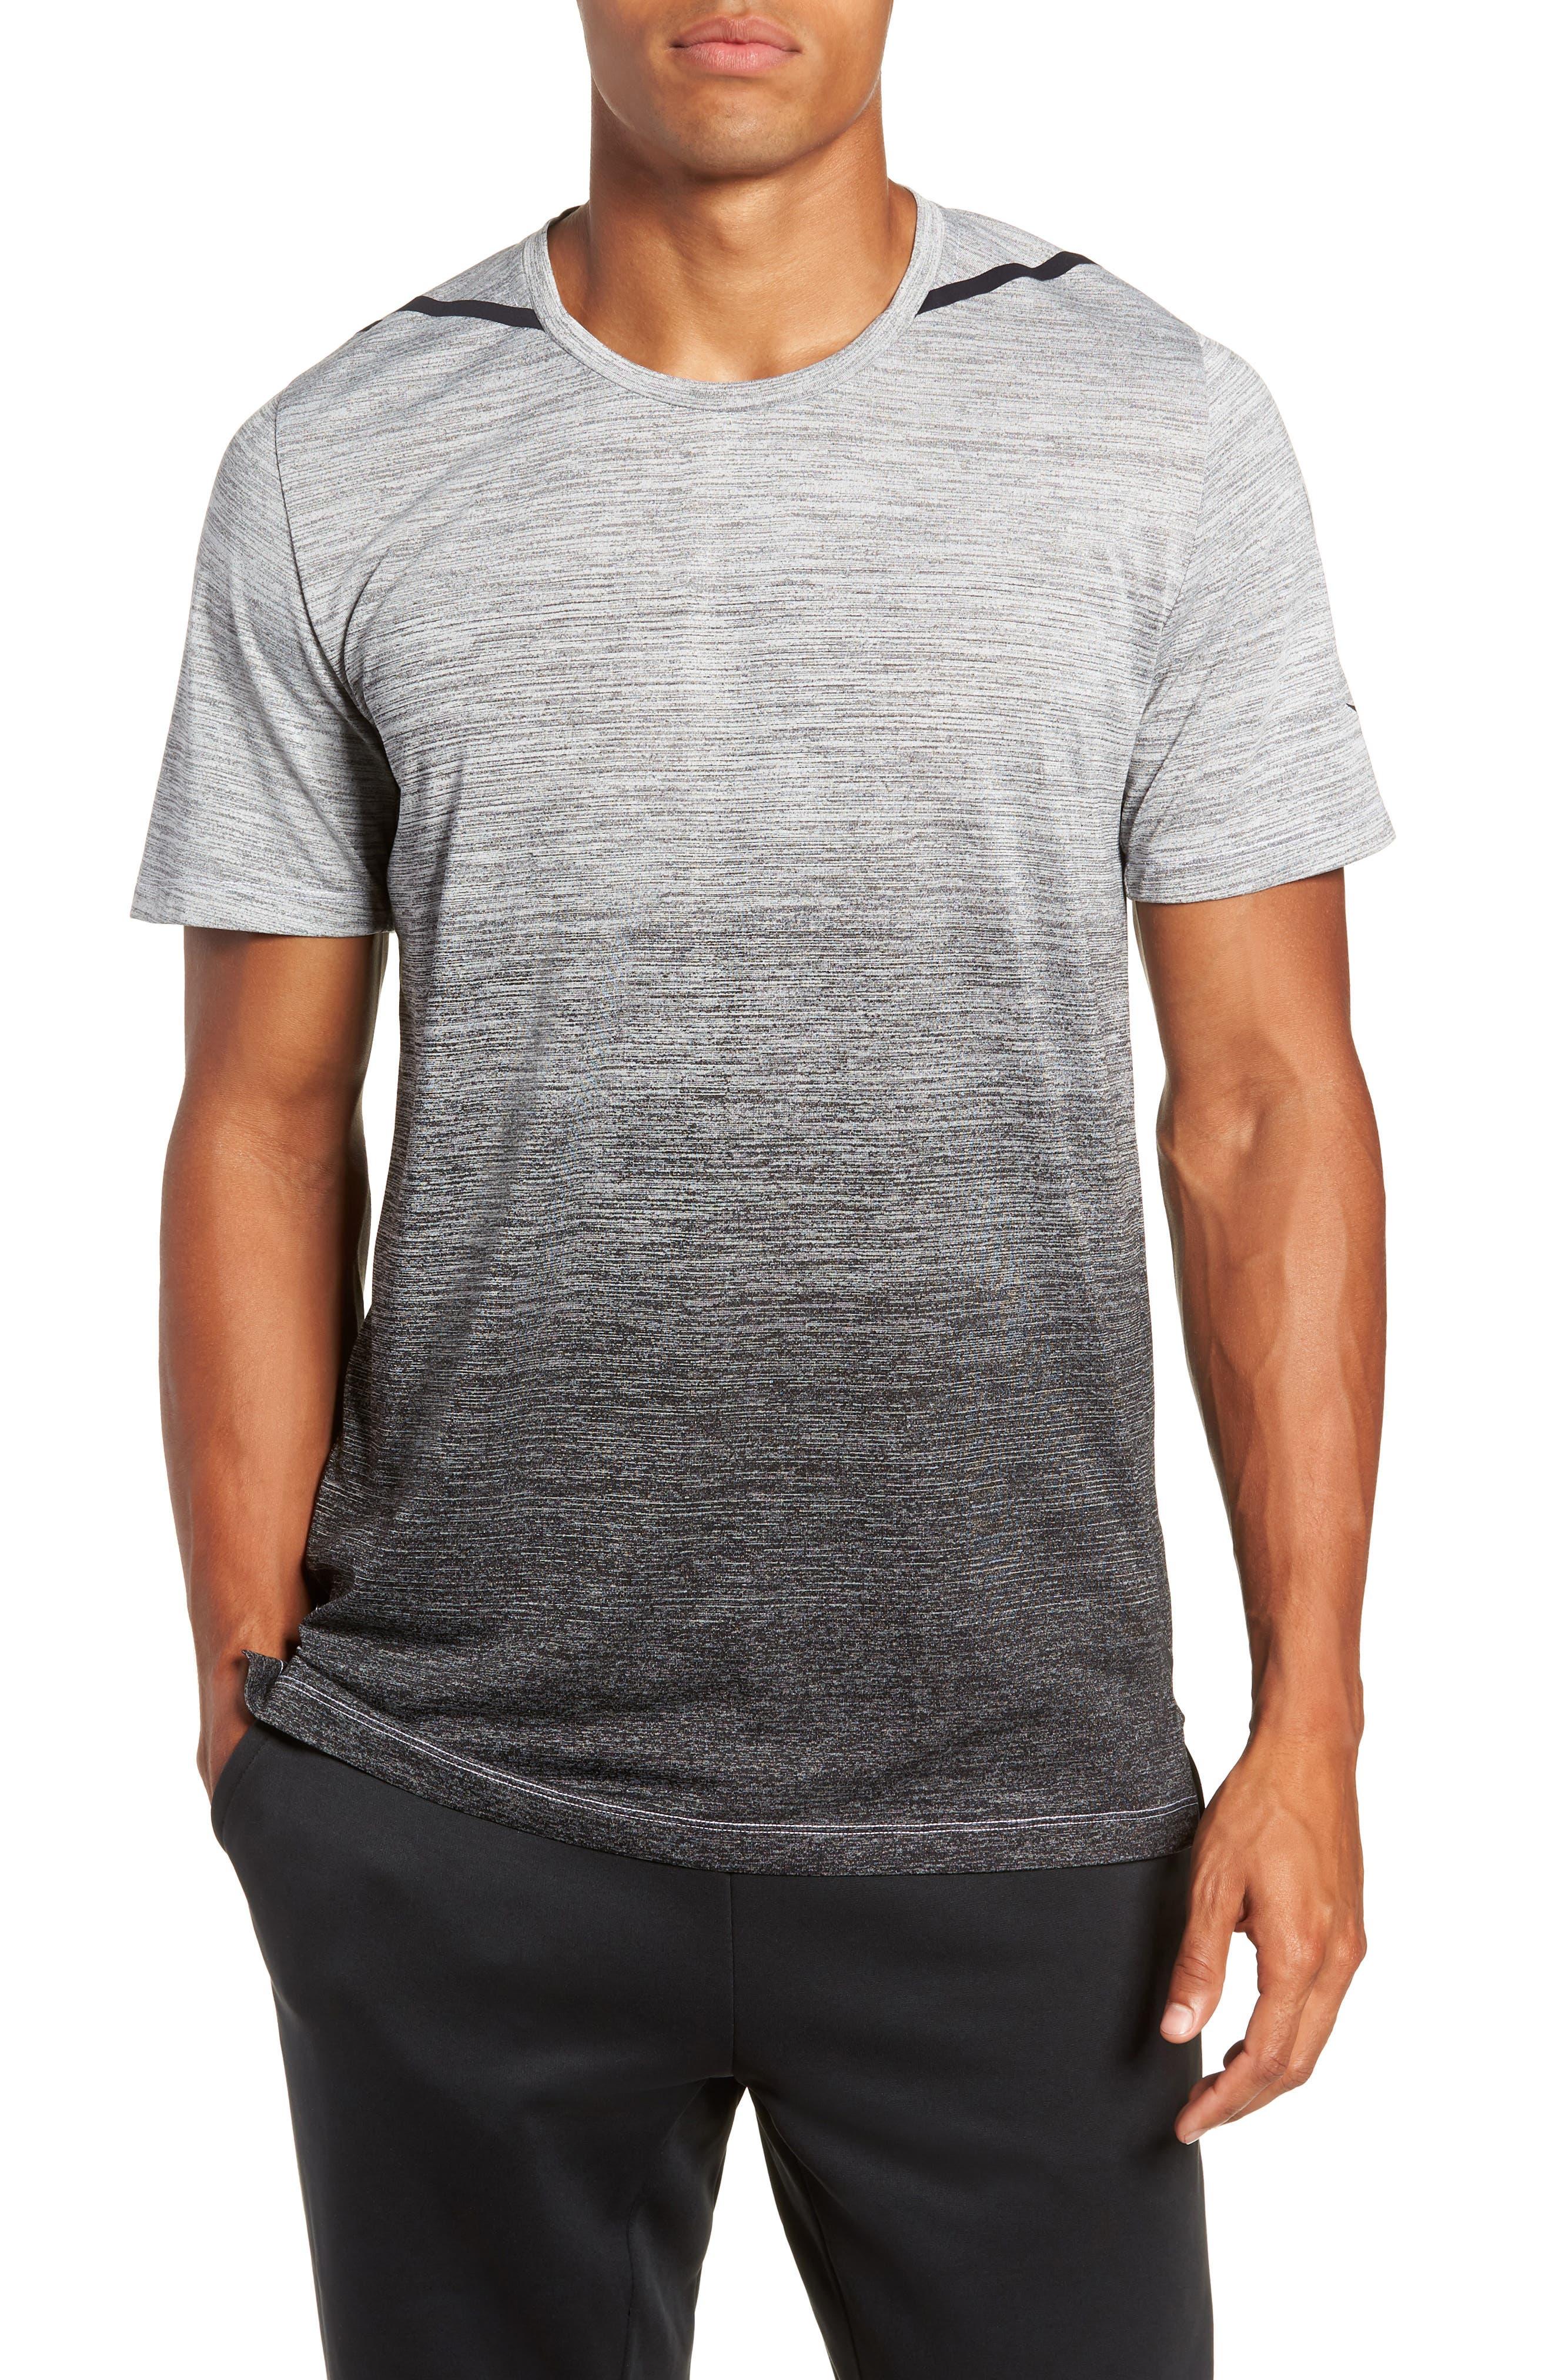 Dry Max Training T-Shirt,                         Main,                         color, BLACK/ WHITE/ HYPER COBALT